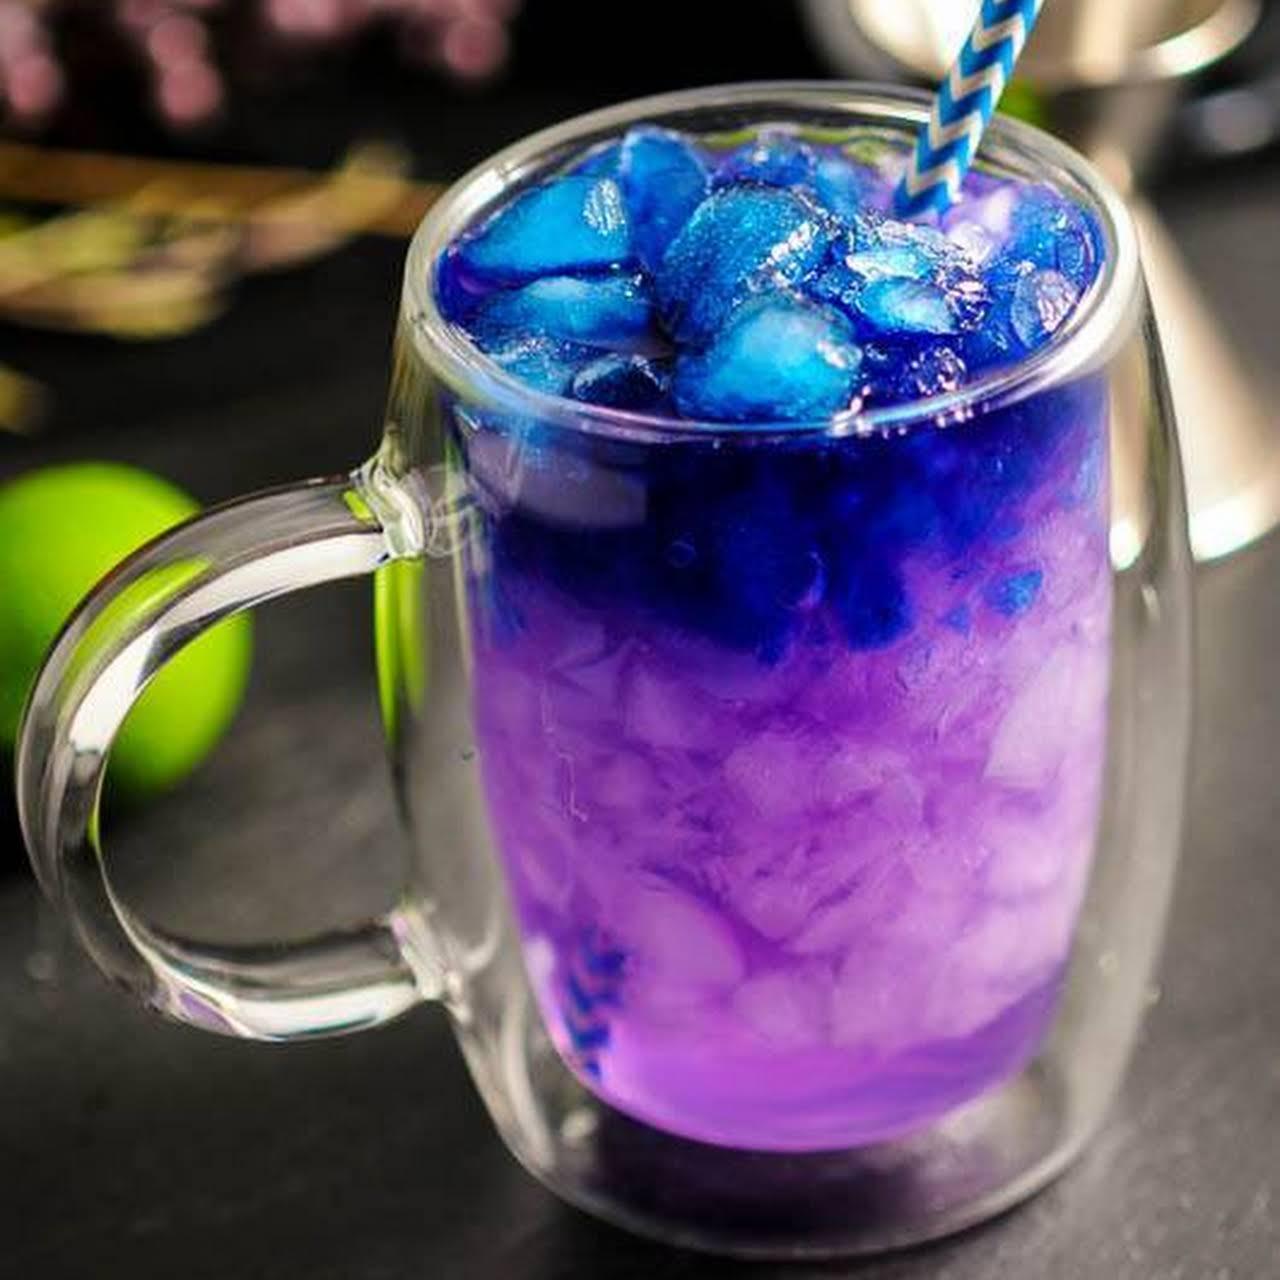 The Galaxy Magic Mule – A Vodka Moscow Mule